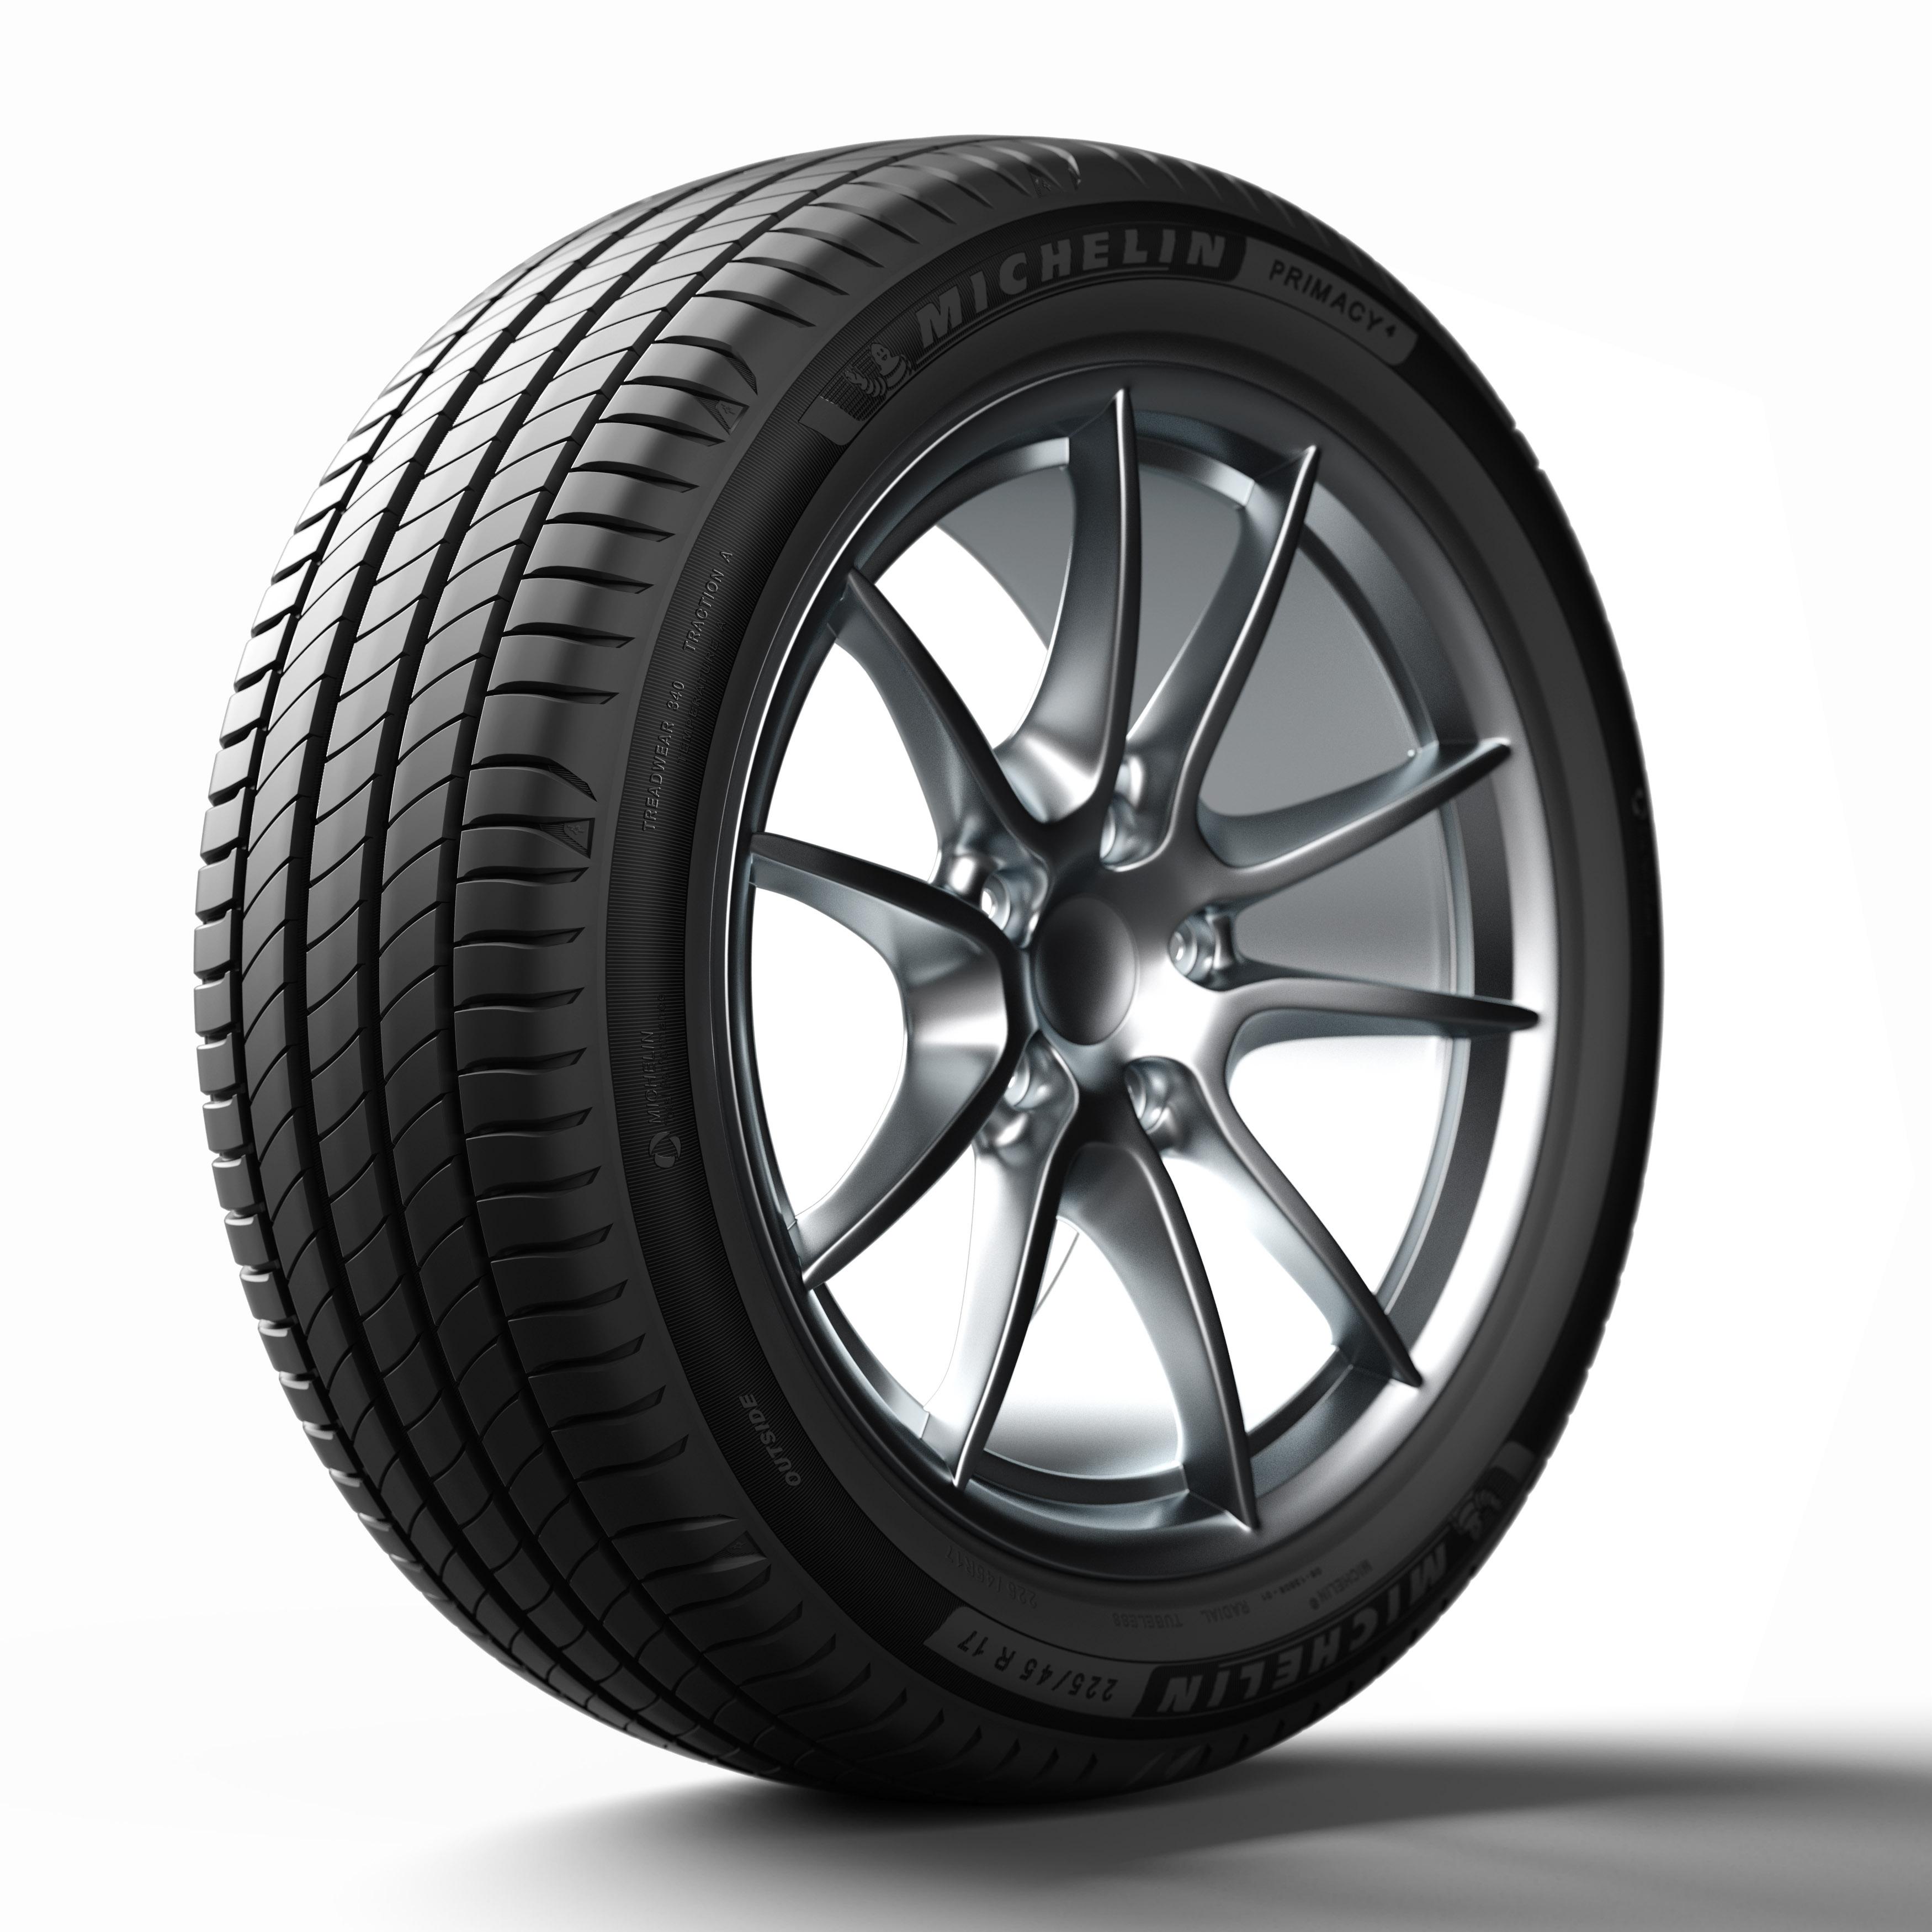 Michelin Tyres Wolverhampton Michelin Tires Cheap Tires Michelin